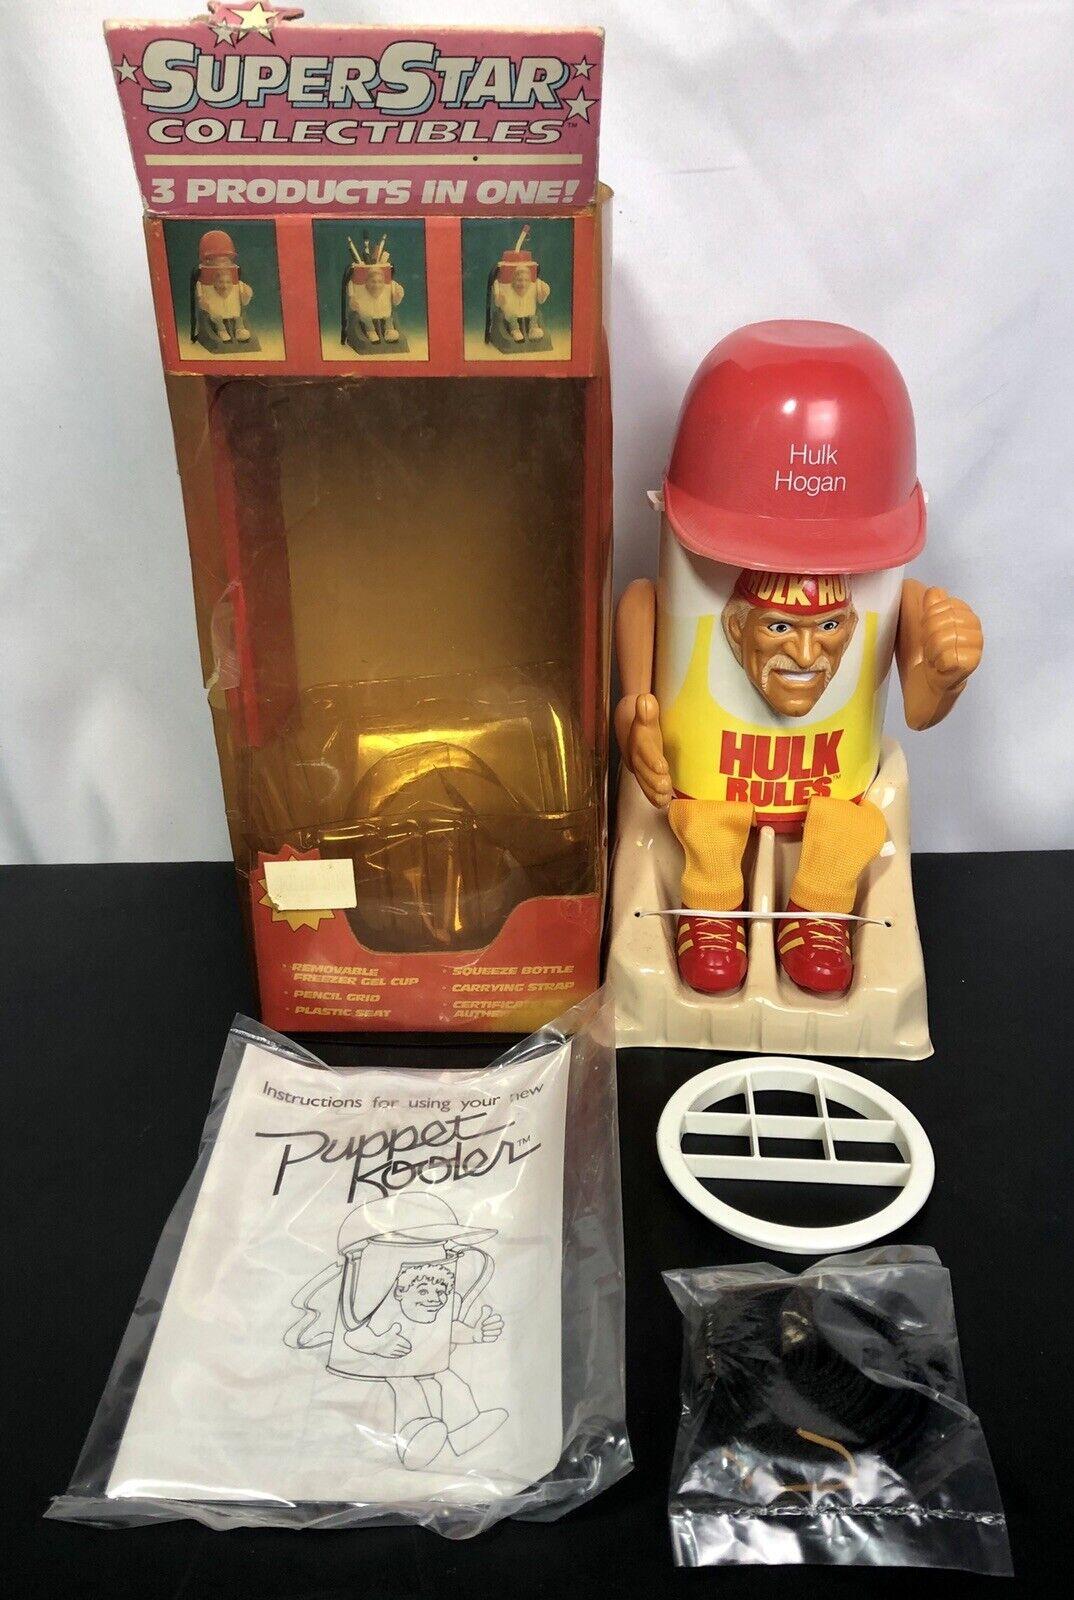 Vintage WWF Wwe Hulk Hogan COOLER CUP -  1990 Superstar Collectibles  à la mode